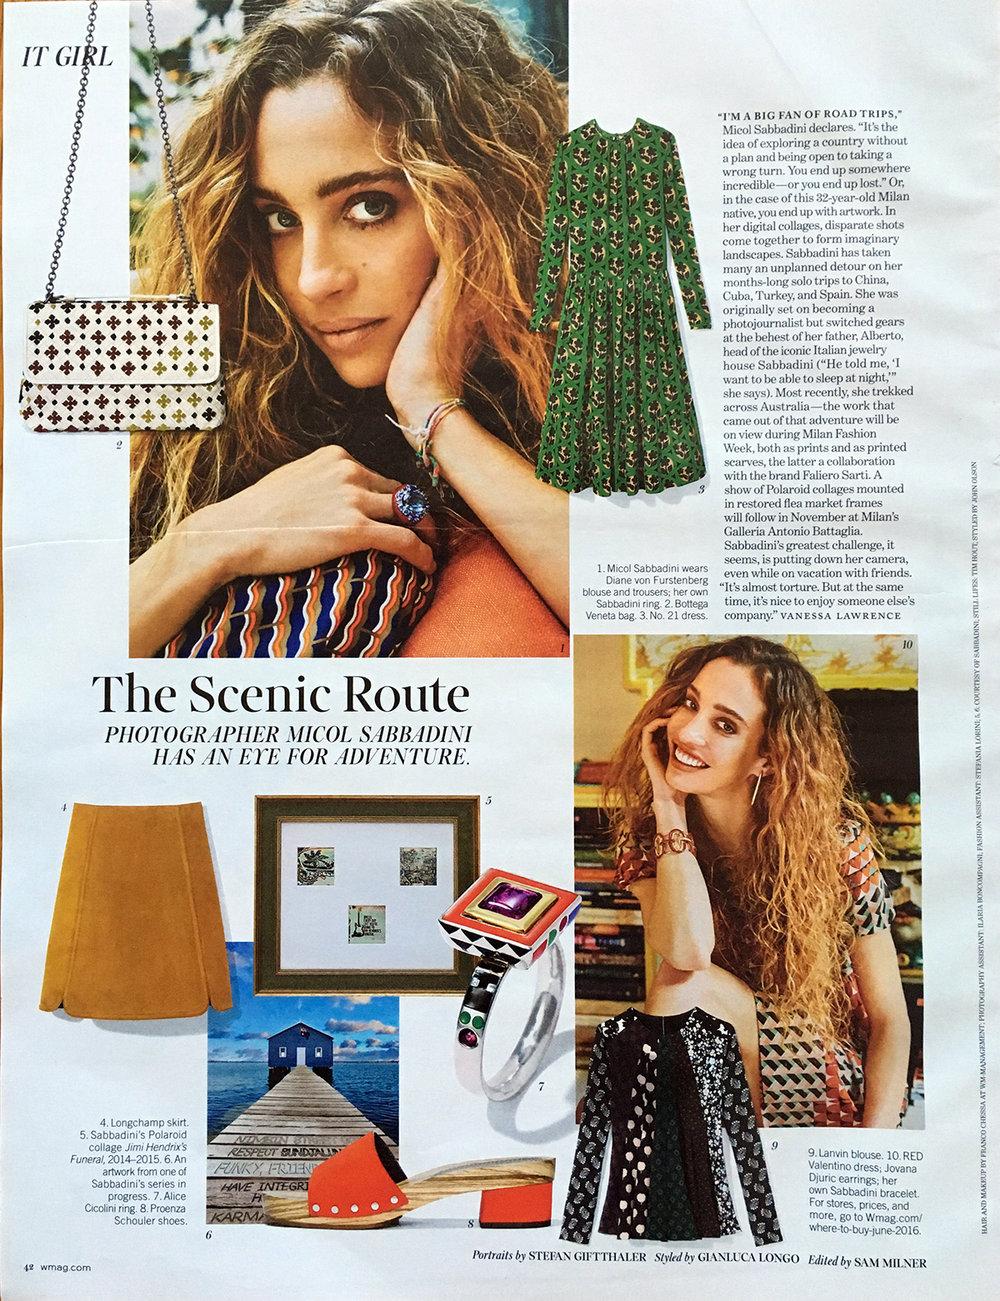 W Magazine Aug 2016 Jovana Djuric 02.jpg